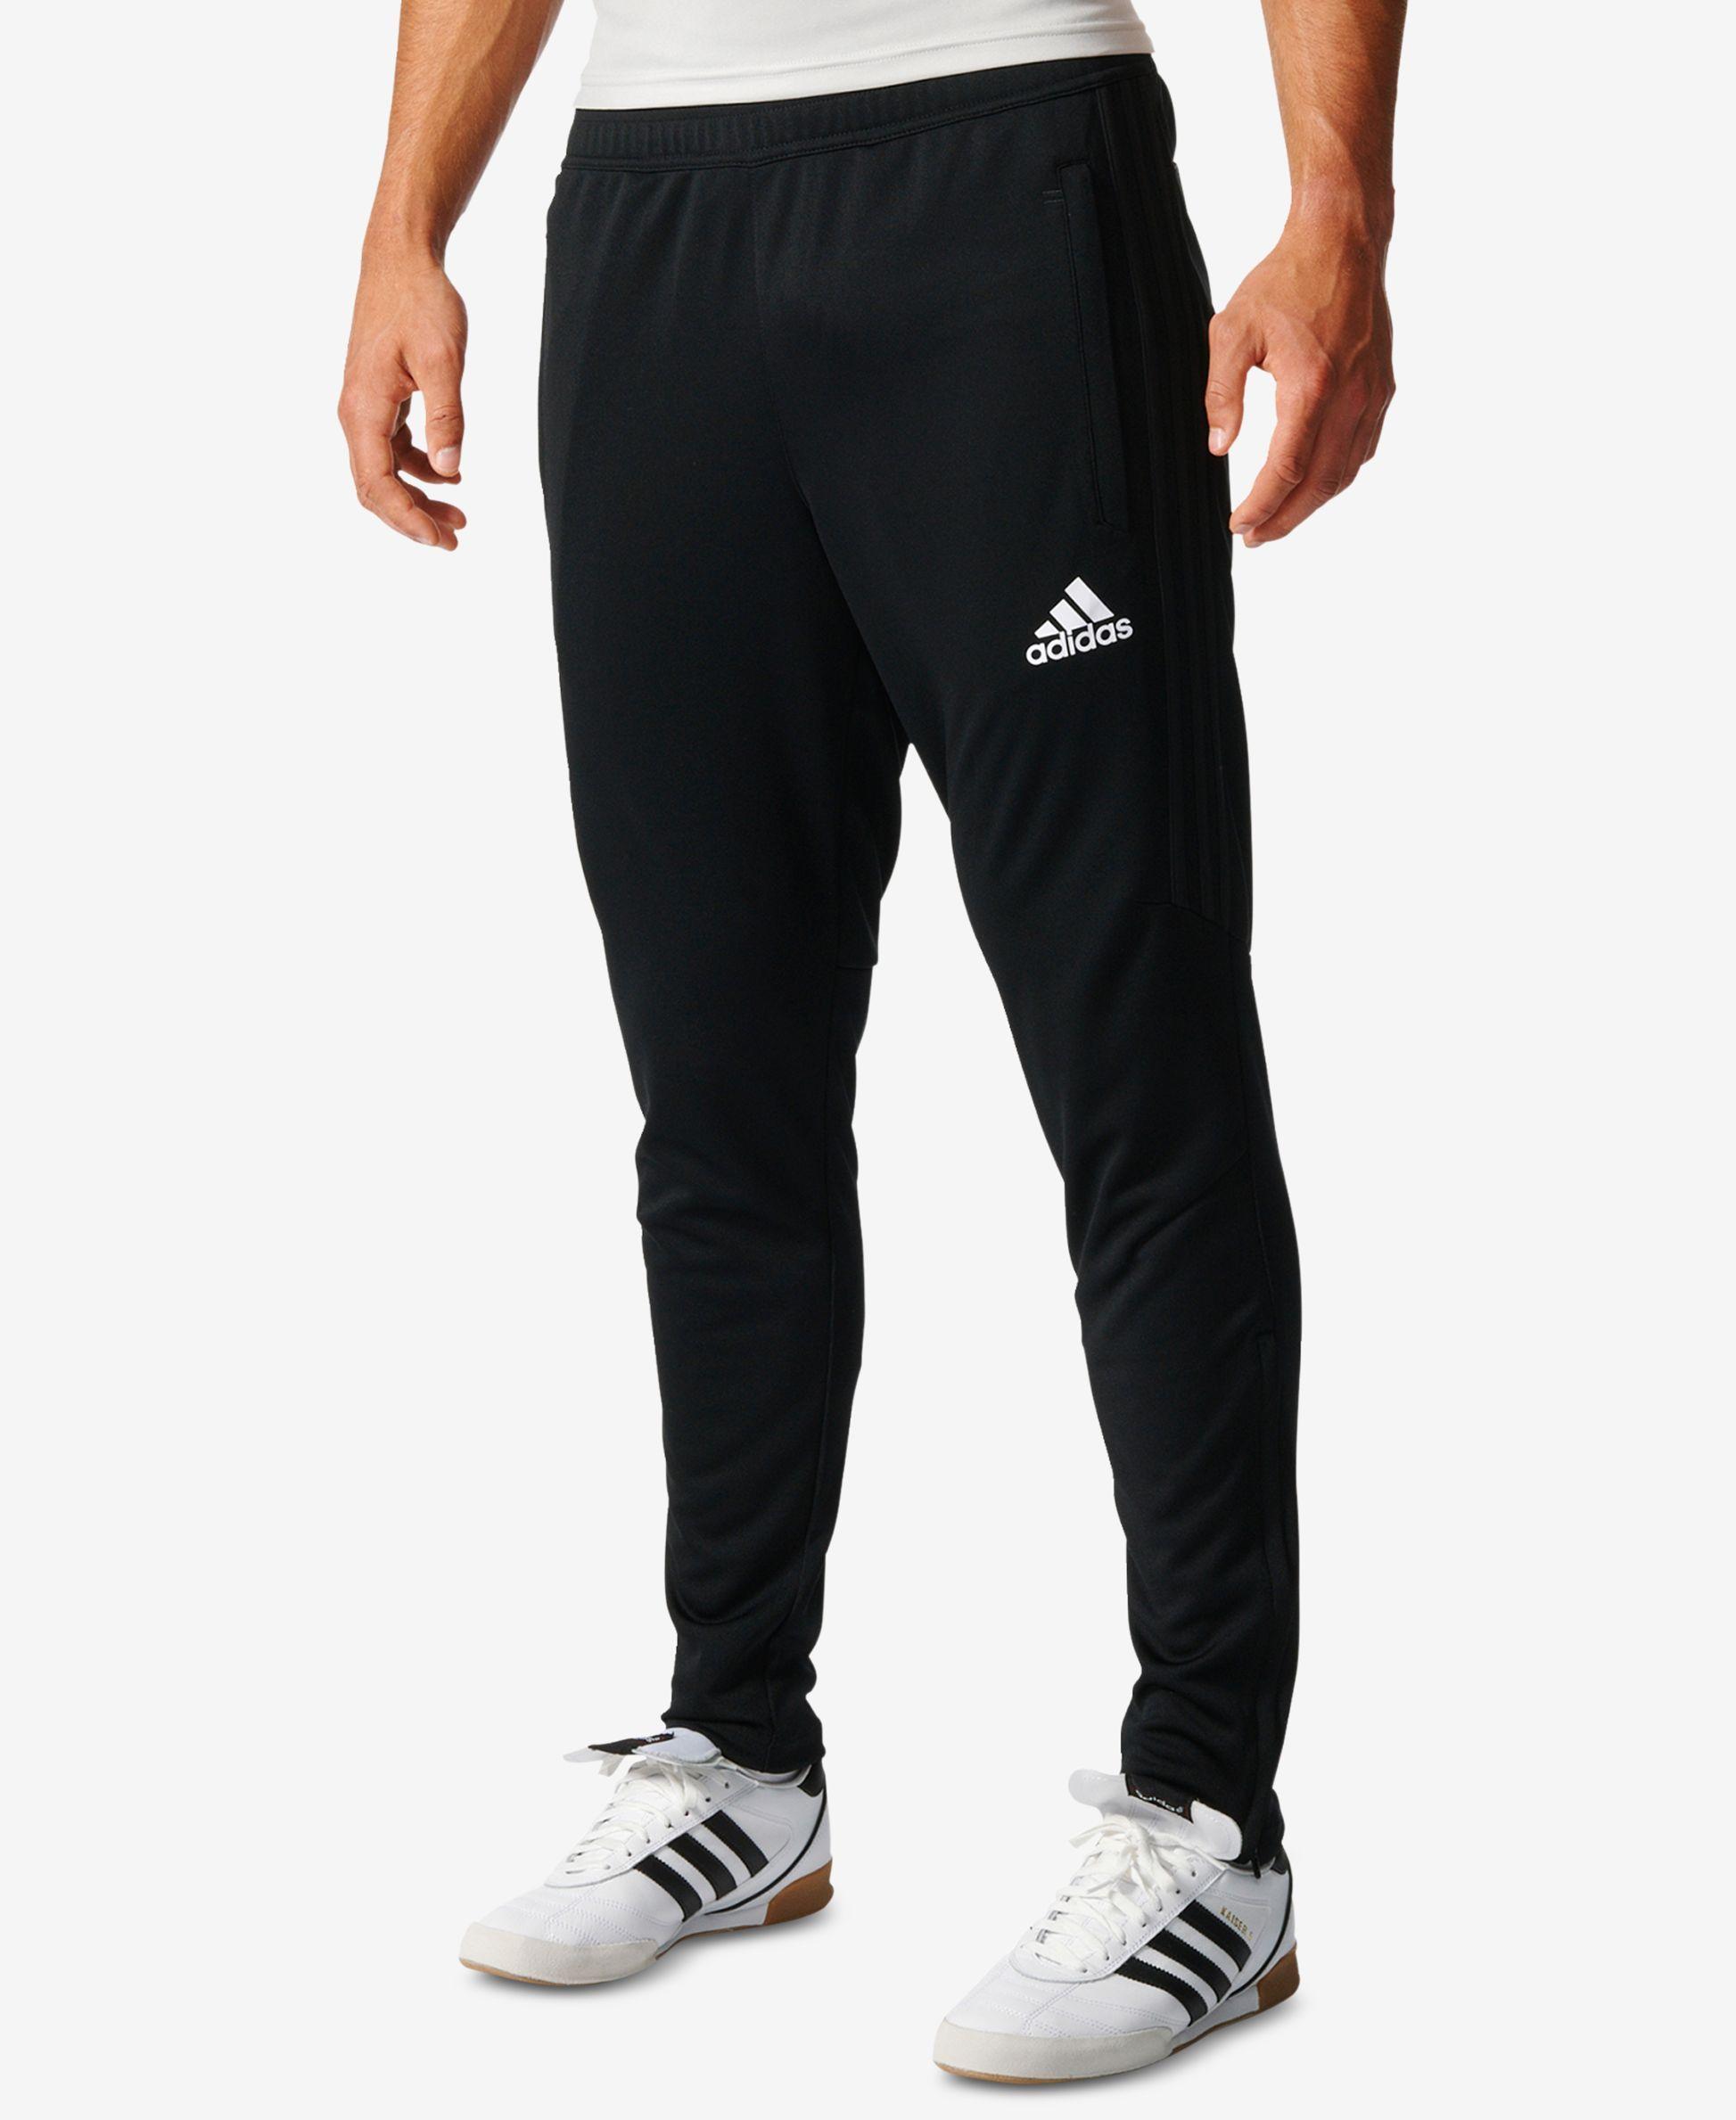 89b51e0a4d8b adidas Men s ClimaCool Tiro 17 Soccer Pants